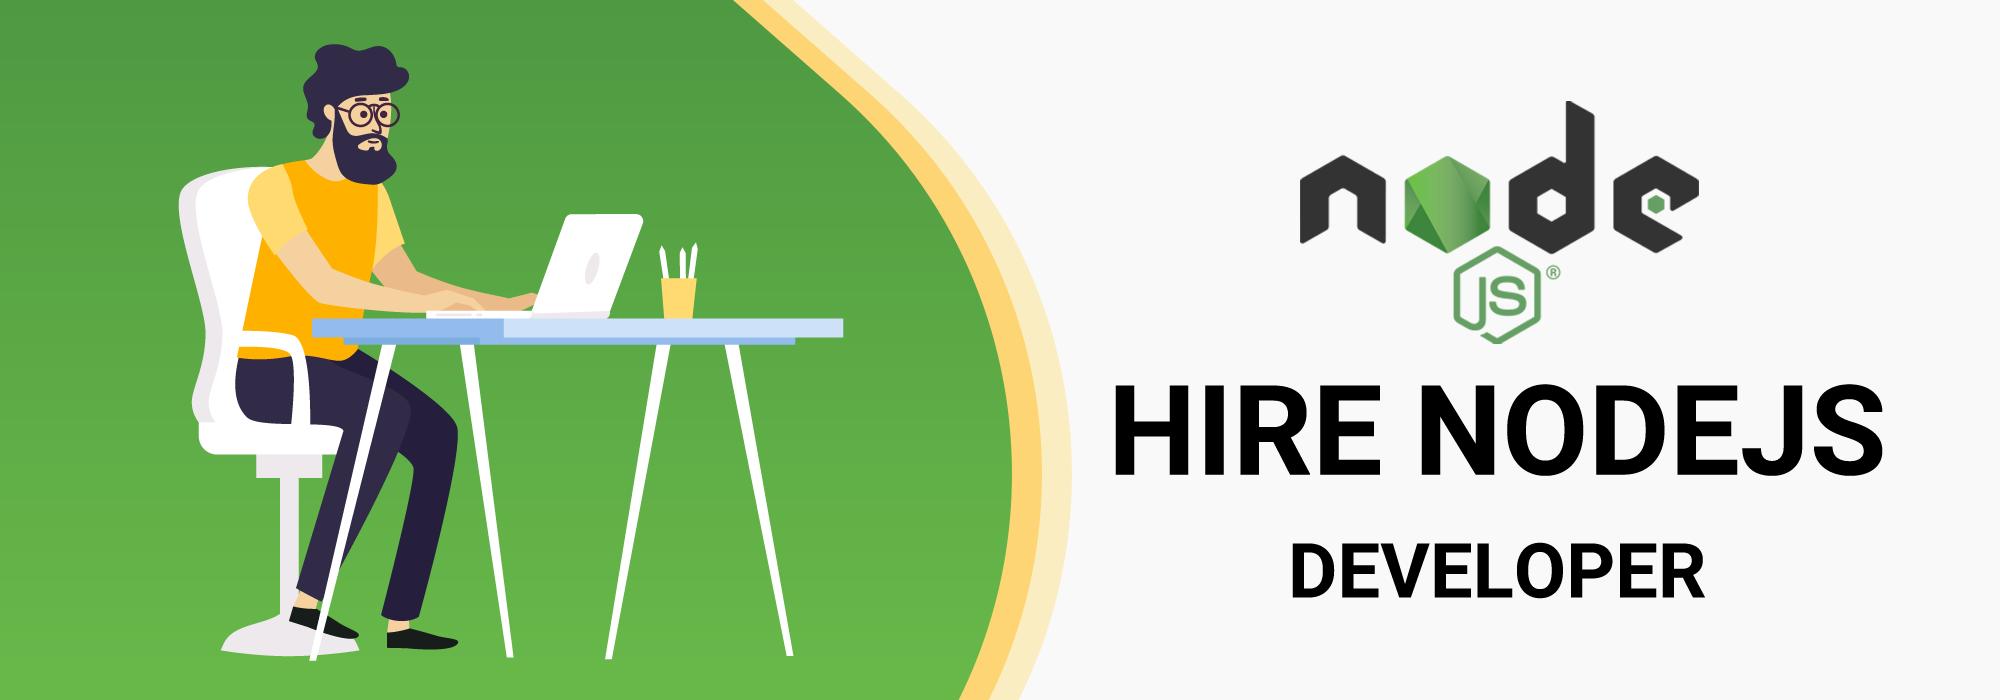 Hire NodeJS Certified Developers uk